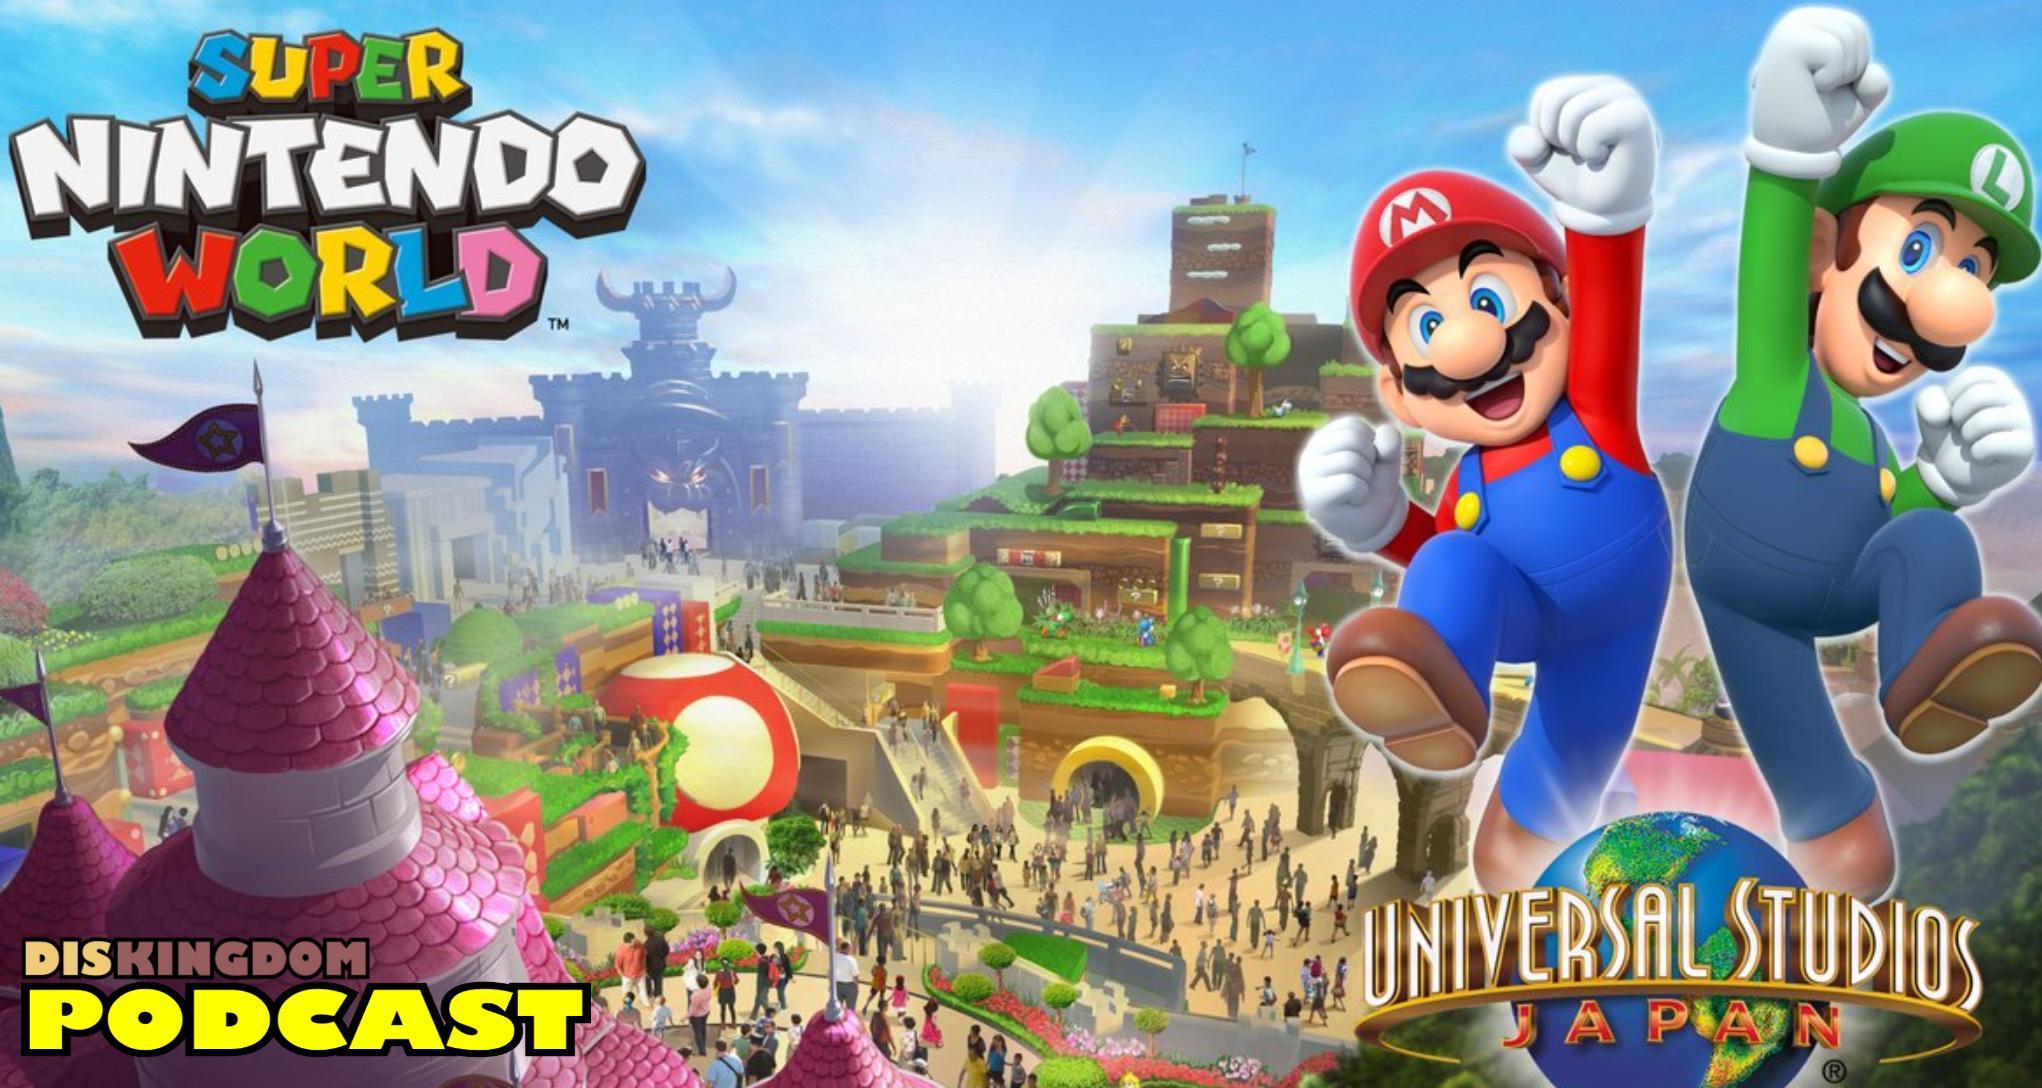 Building Starts On Super Mario World In Universal Studios Japan | DisKingdom Podcast